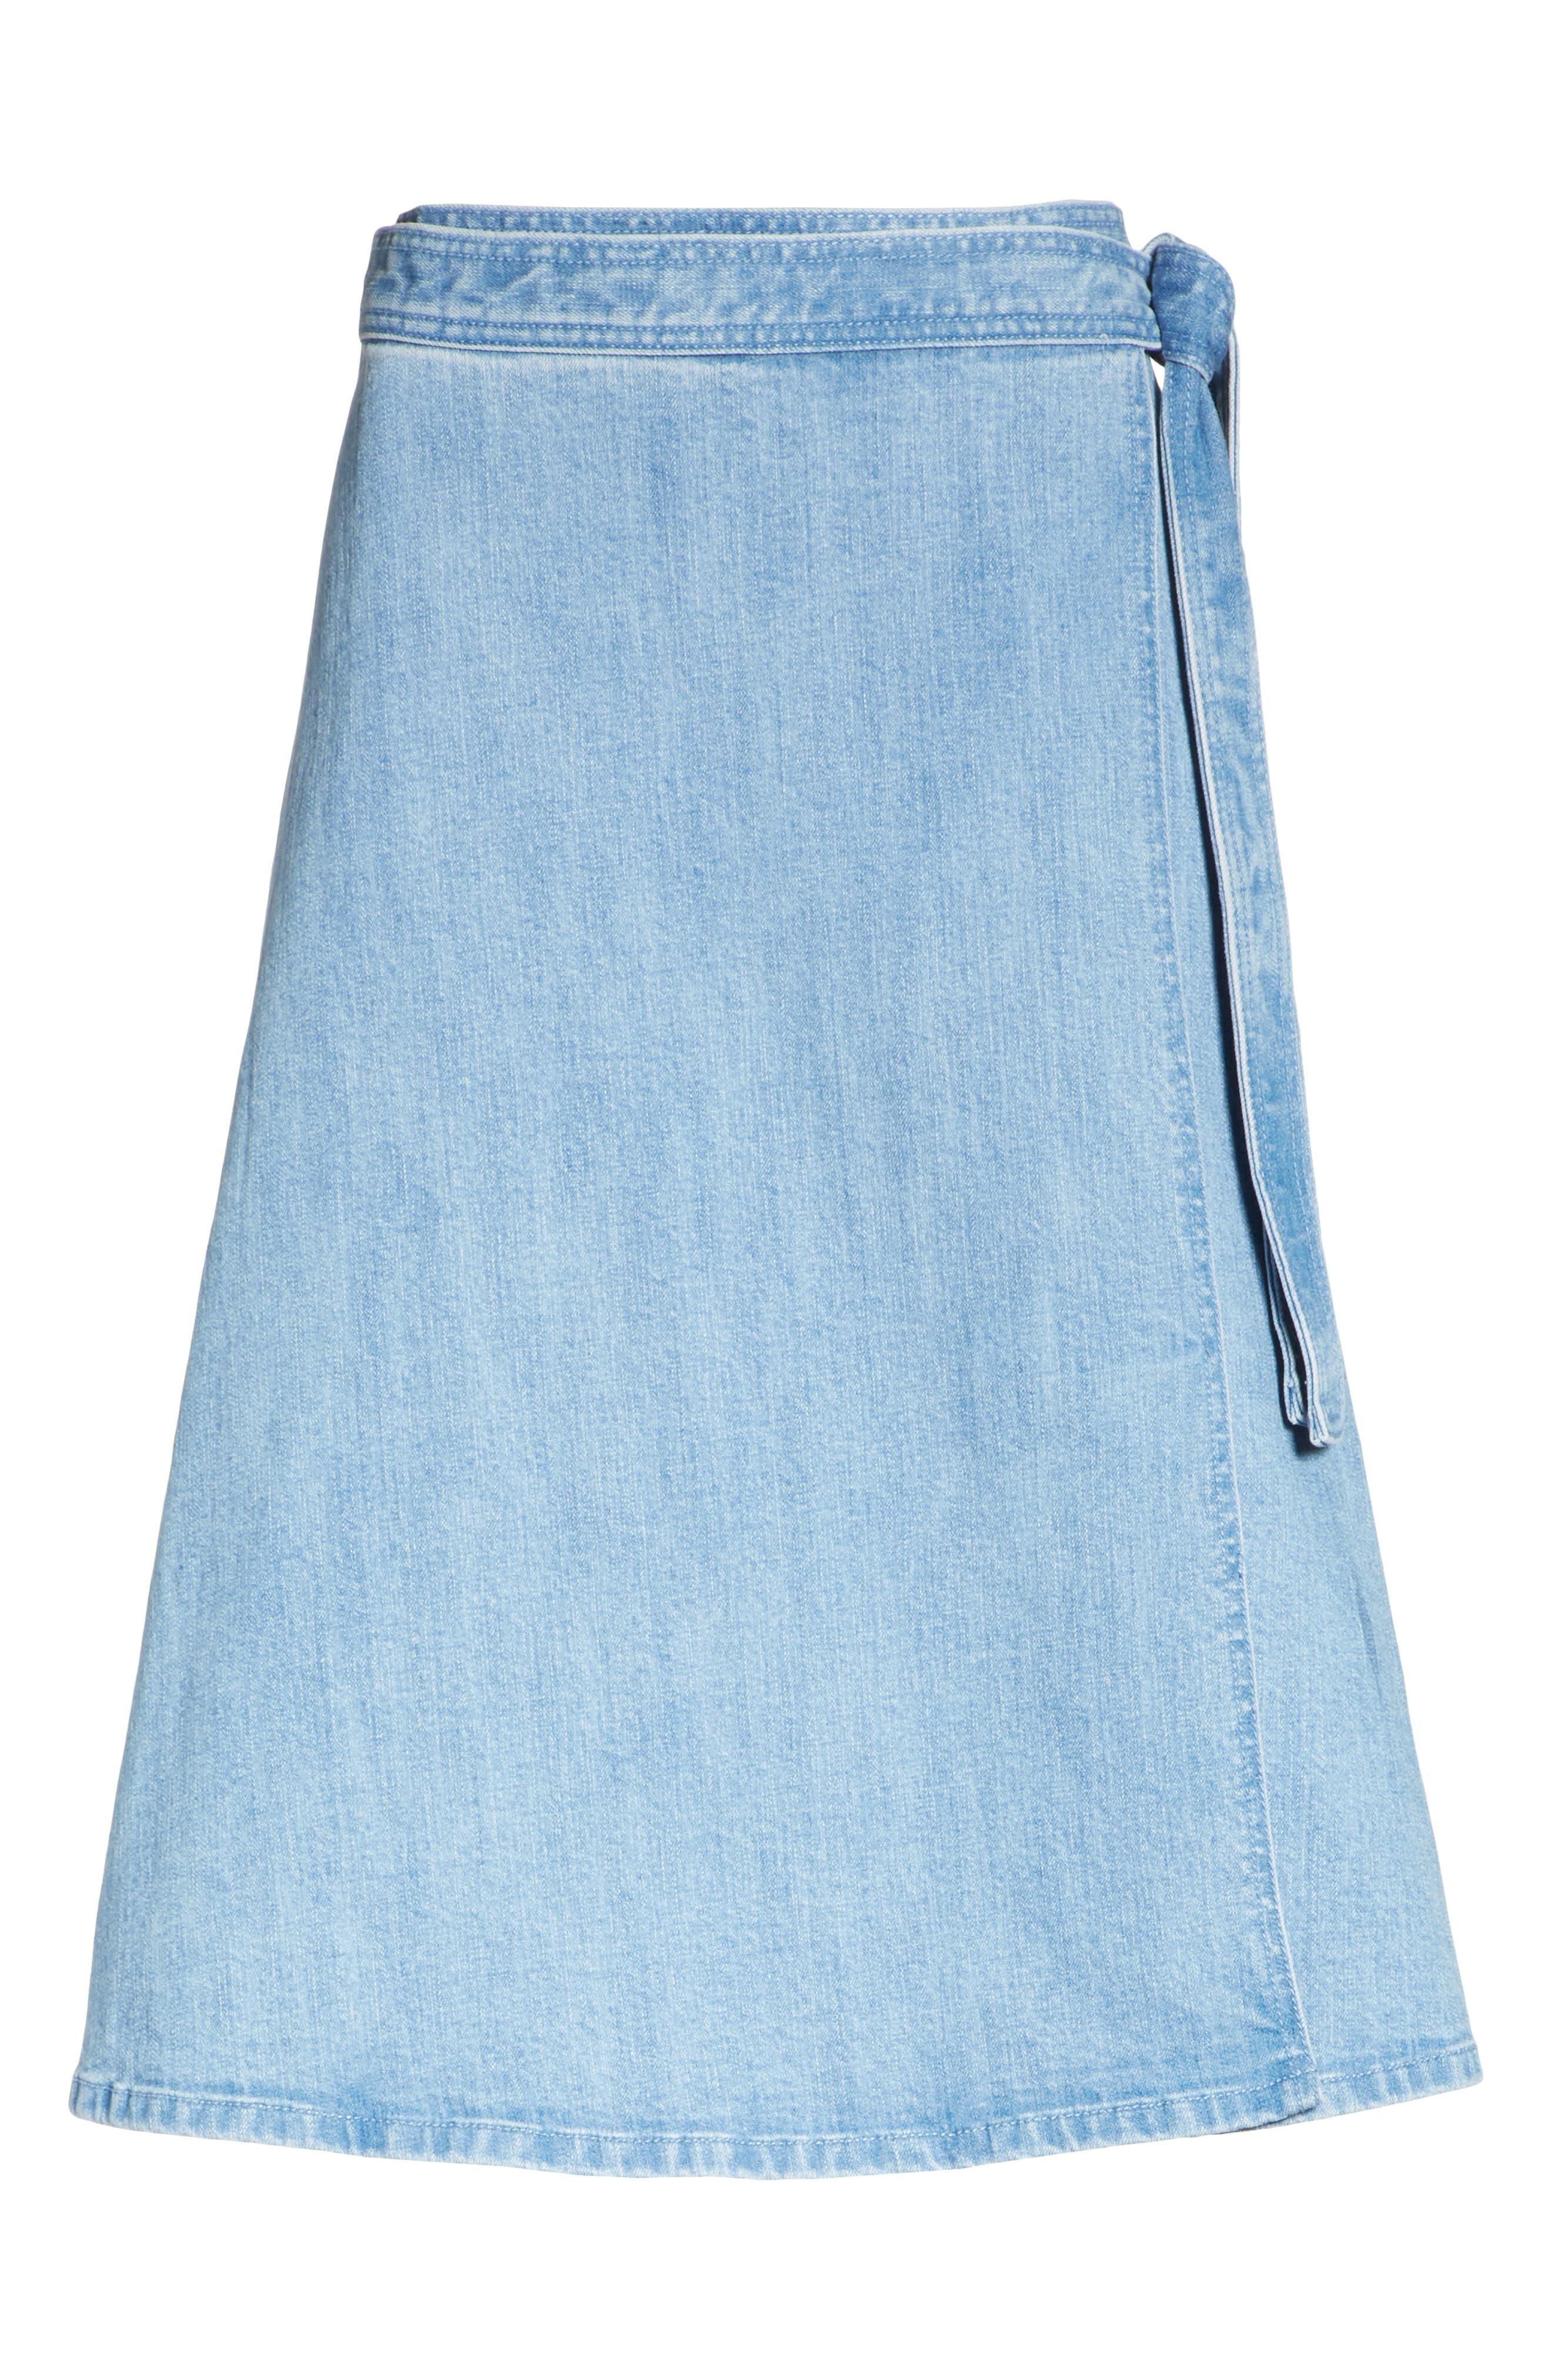 vintage stretch denim wrap skirt,                             Alternate thumbnail 6, color,                             429